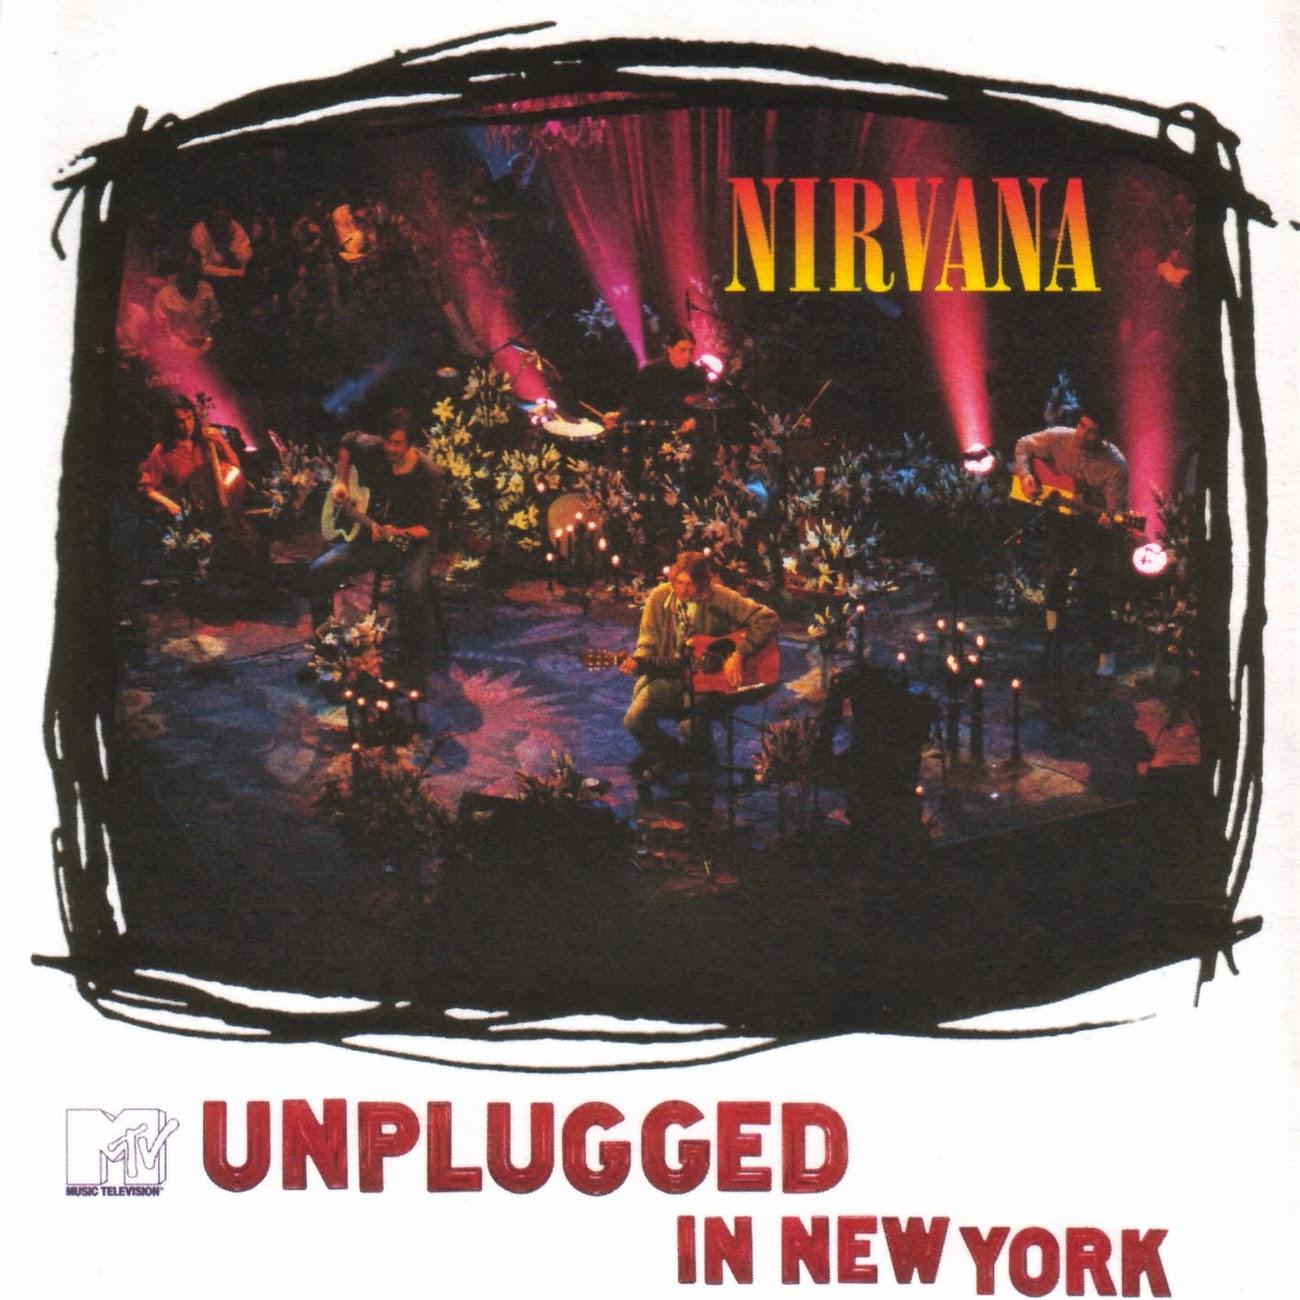 Nirvana - MTV Unplugged In New York (1994) - 90's Rock